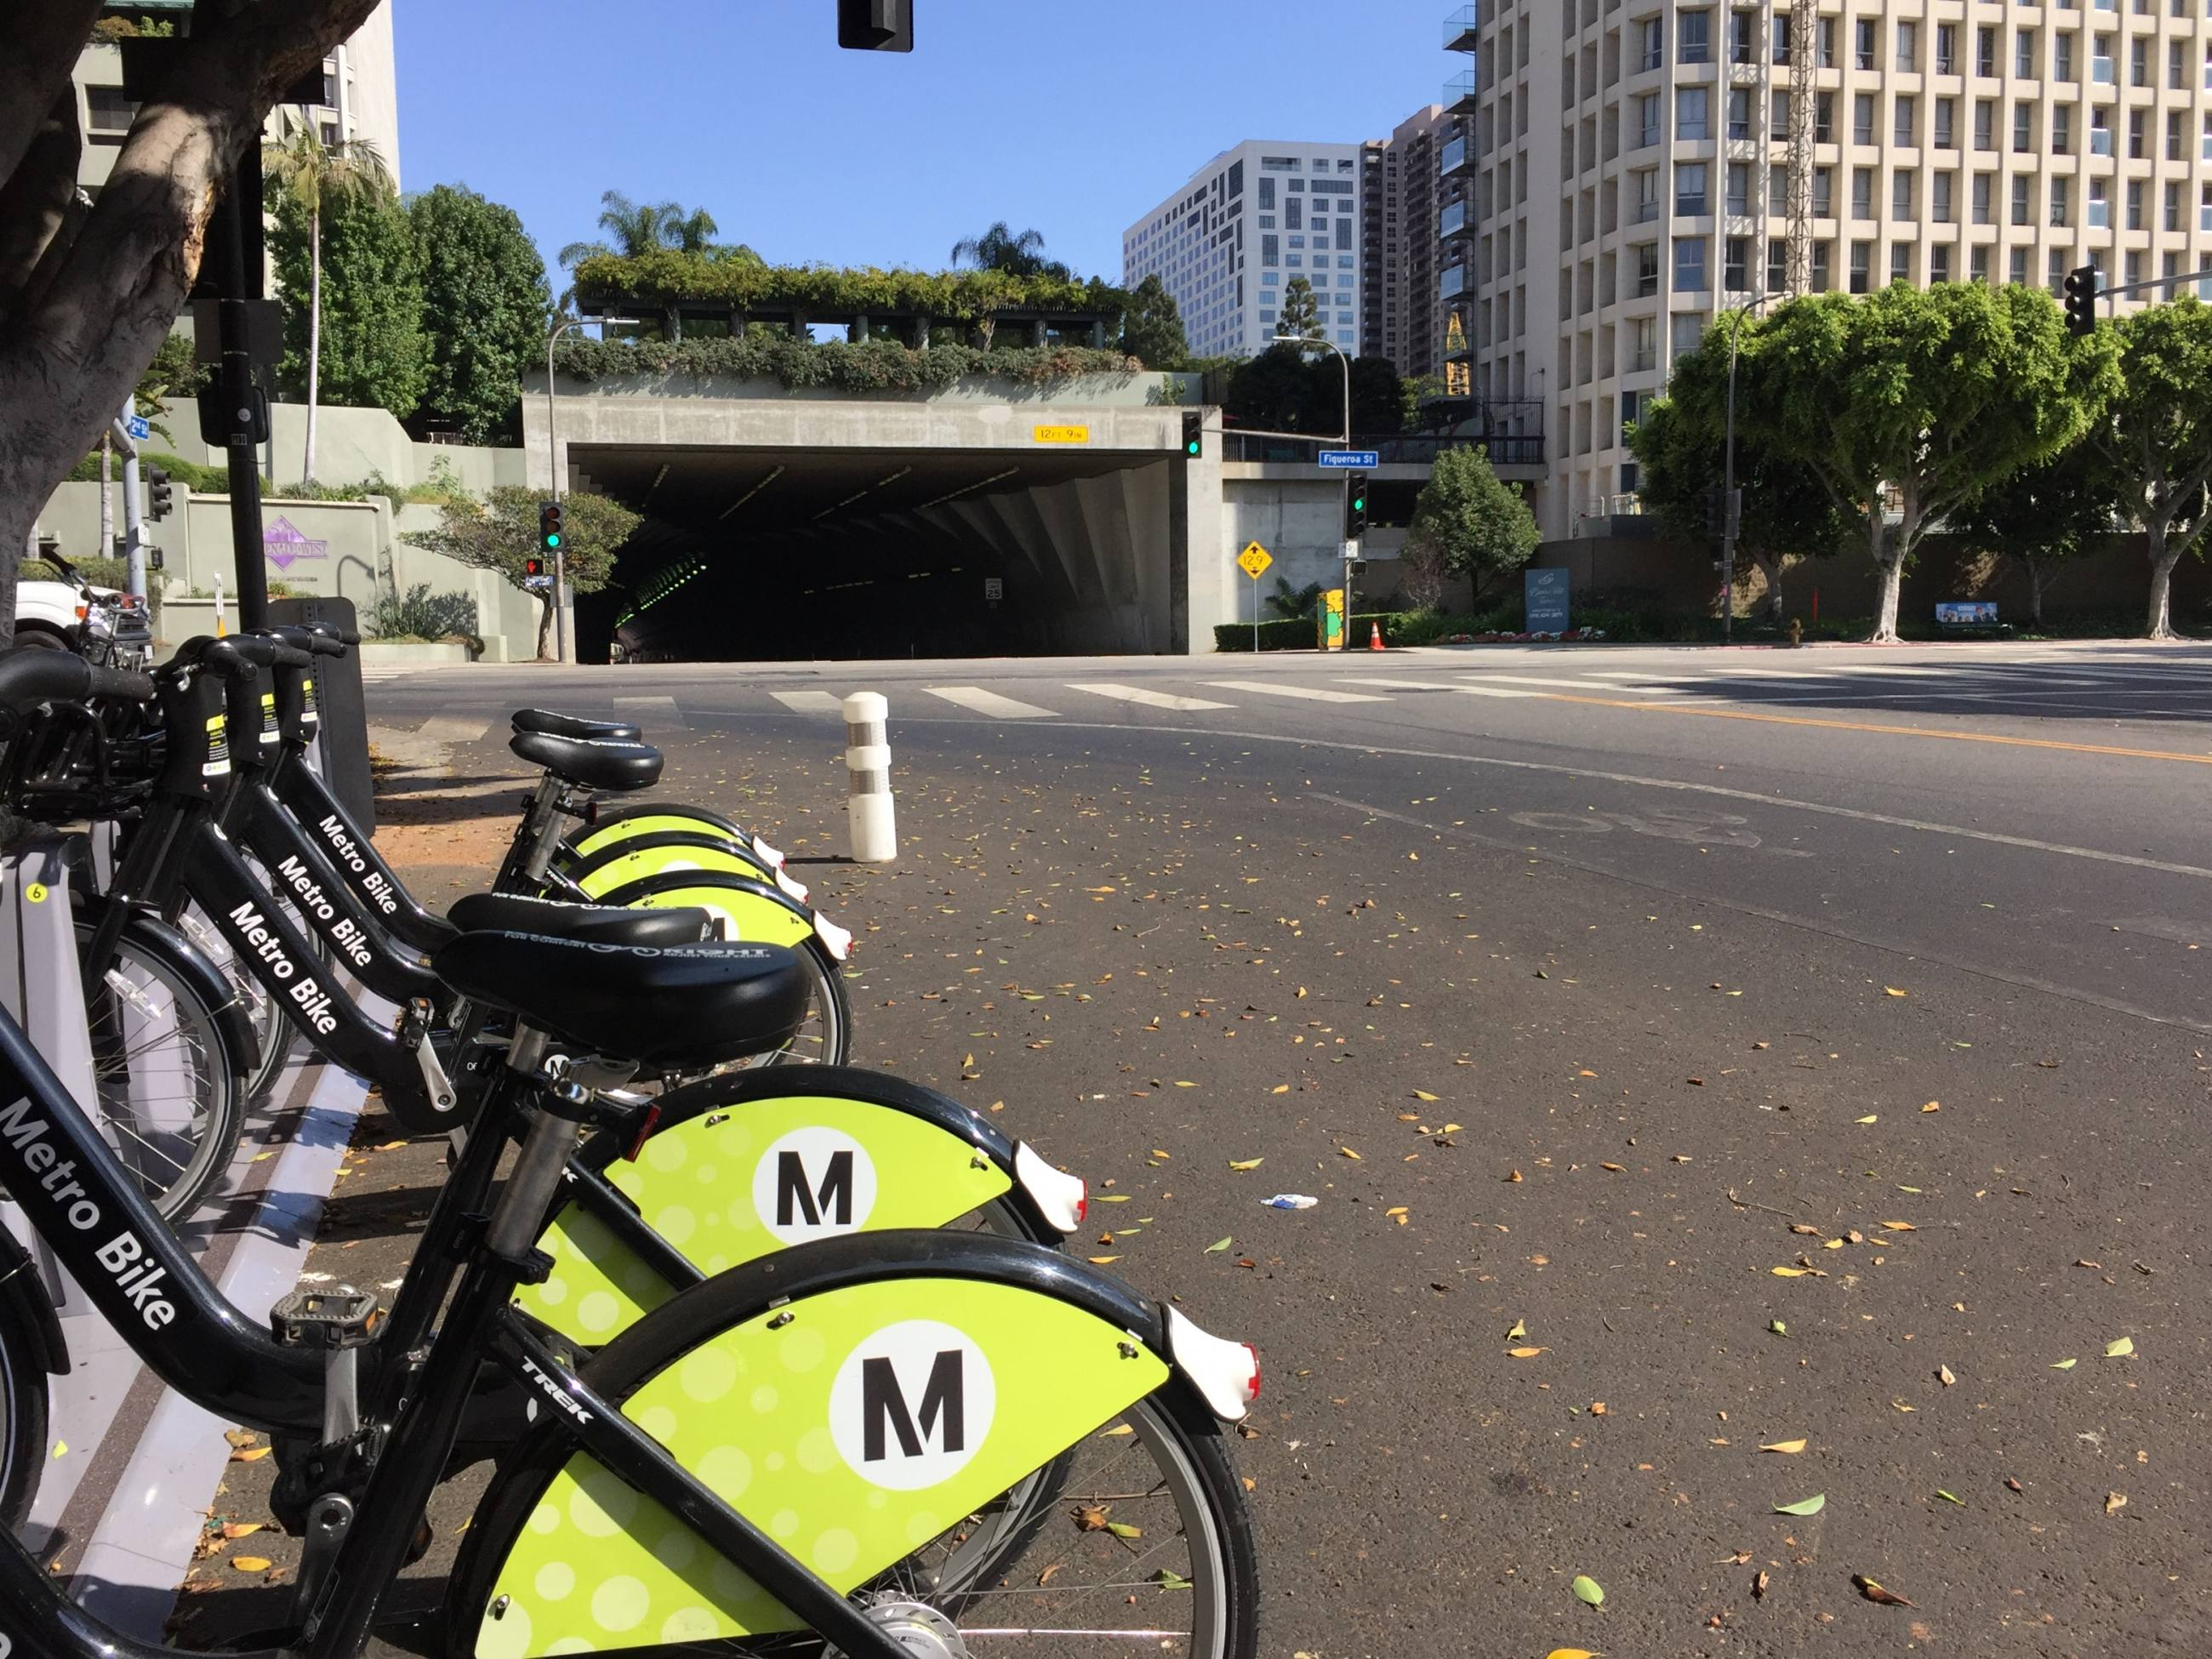 Metro Bike Share Station at 2nd Street & Figueroa